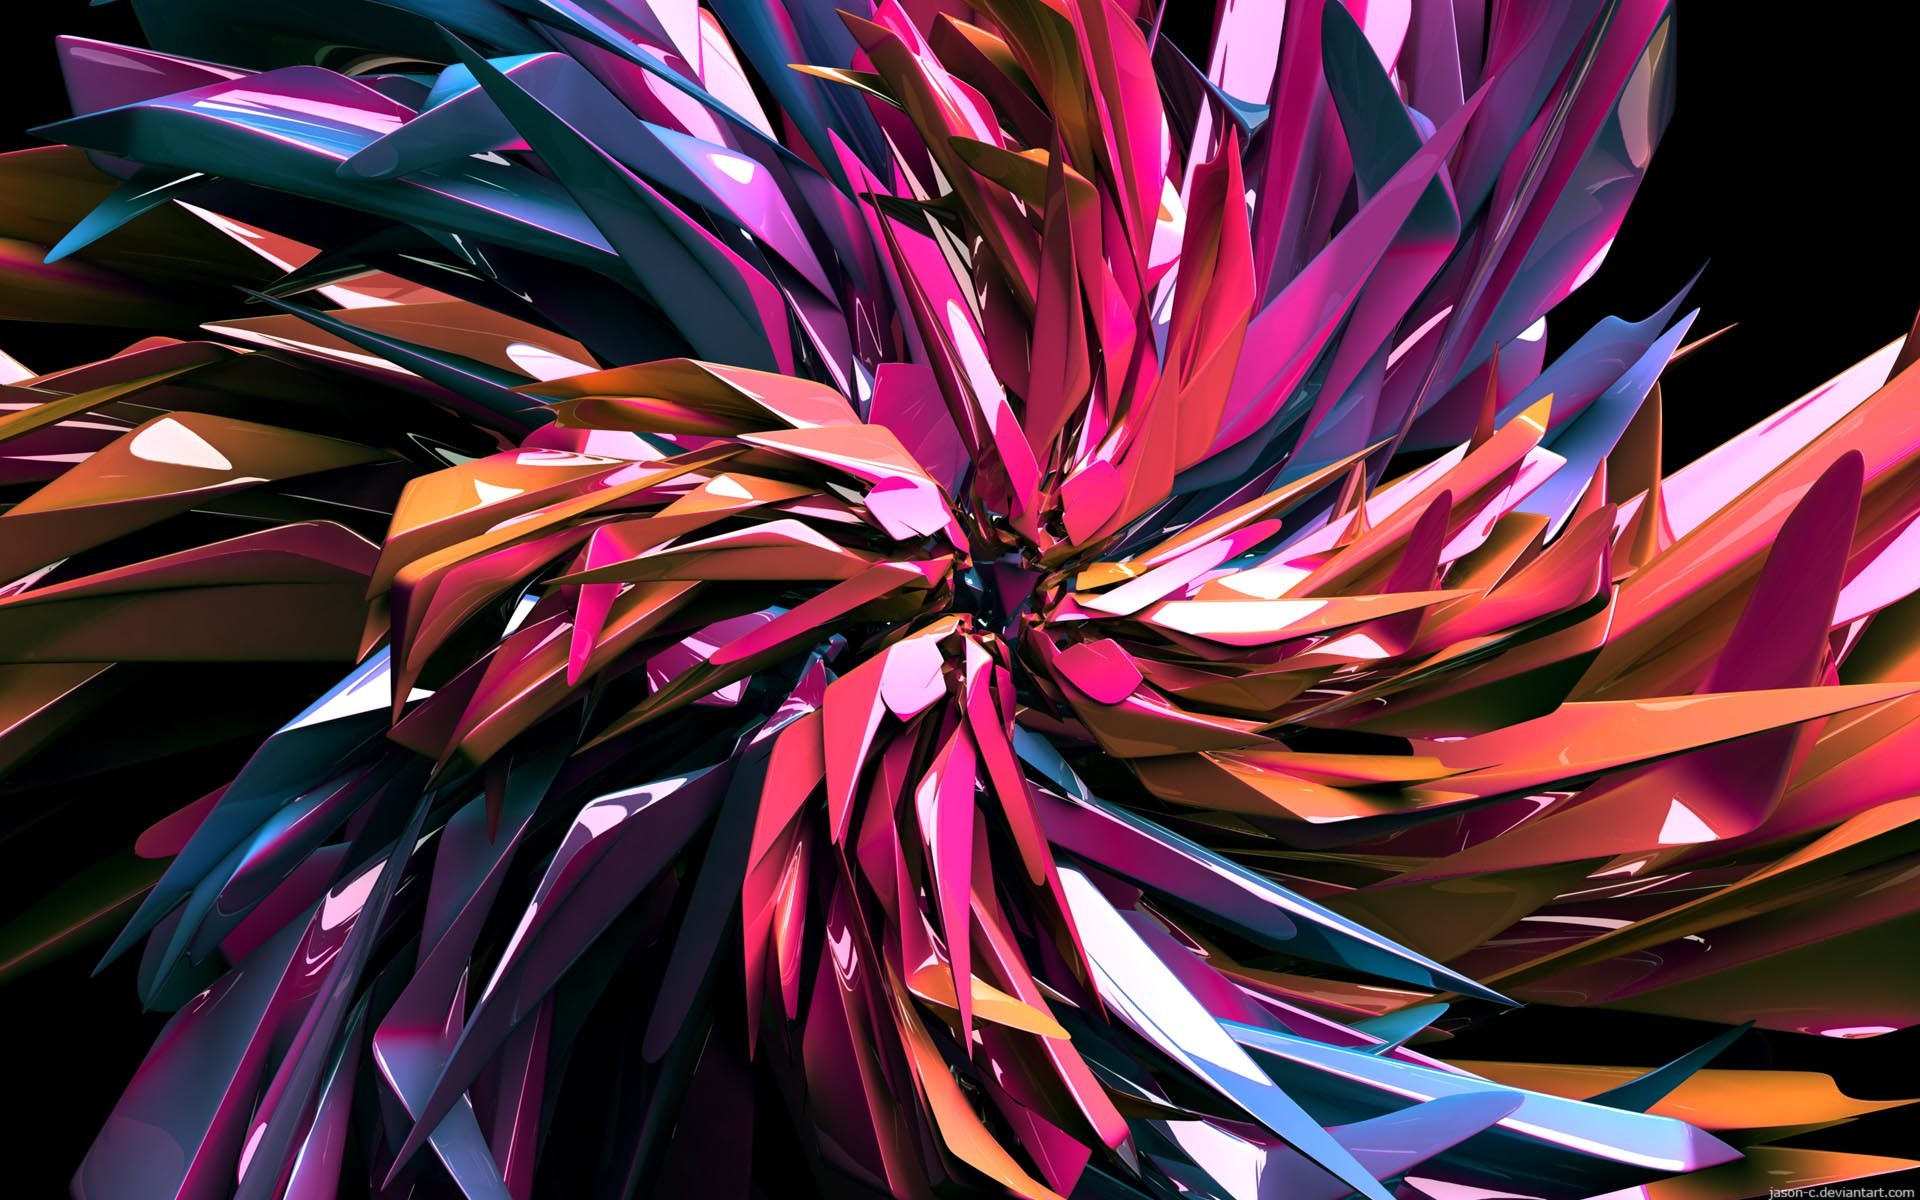 Res: 1920x1200, Abstract Desktop Wallpaper   Free Wallpaper   freefullhdwall.com